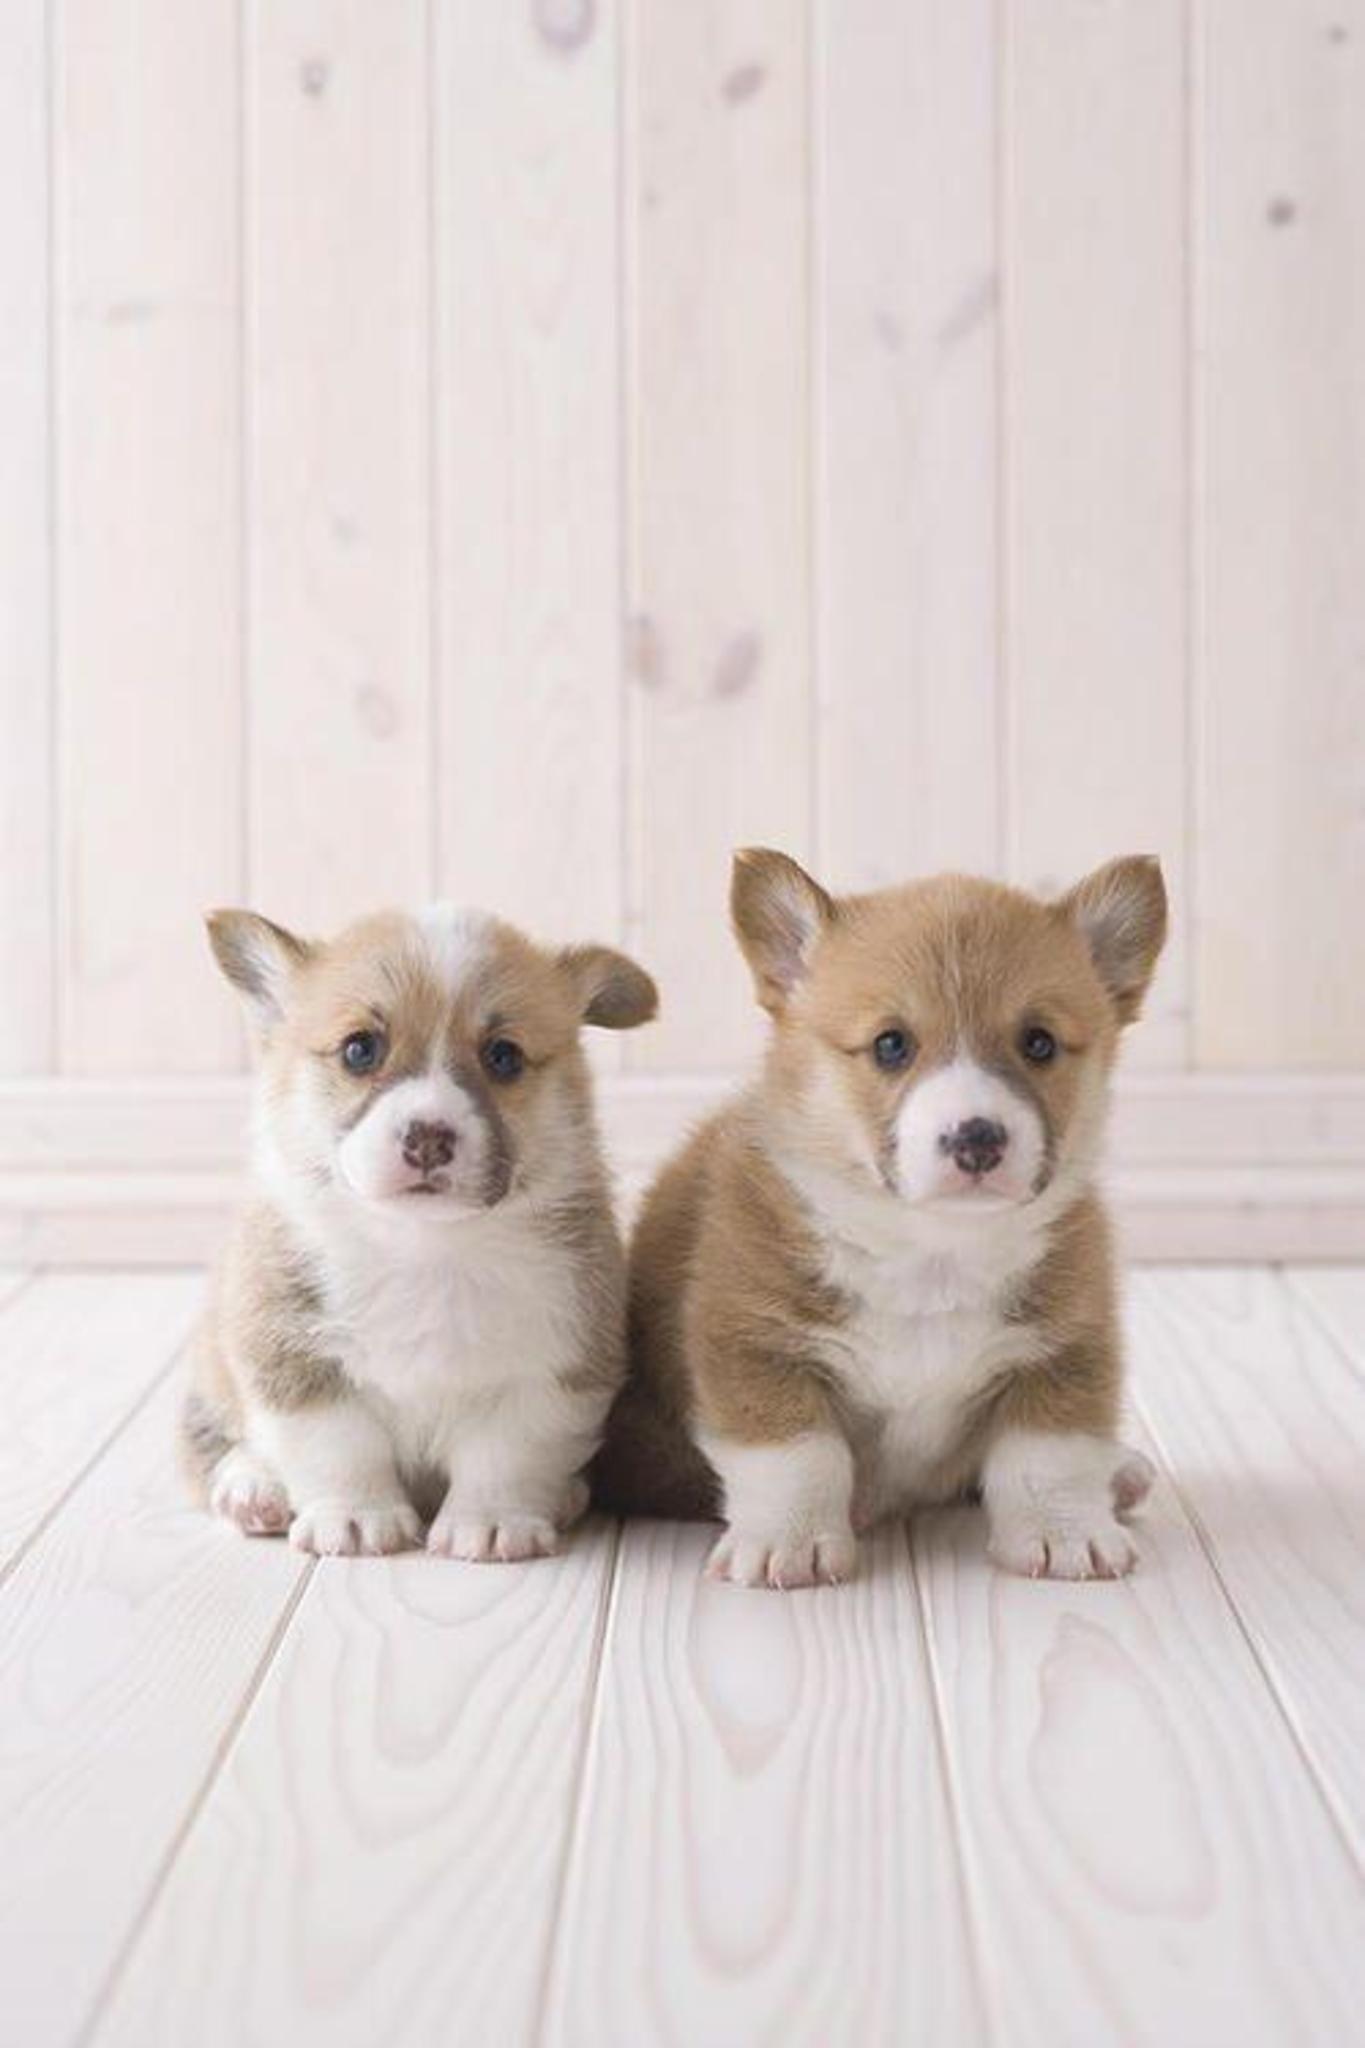 Fantastic Pupies Chubby Adorable Dog - 1d5e2b3c1321c3bf90b1aba3d6de4dec  Perfect Image Reference_626241  .jpg